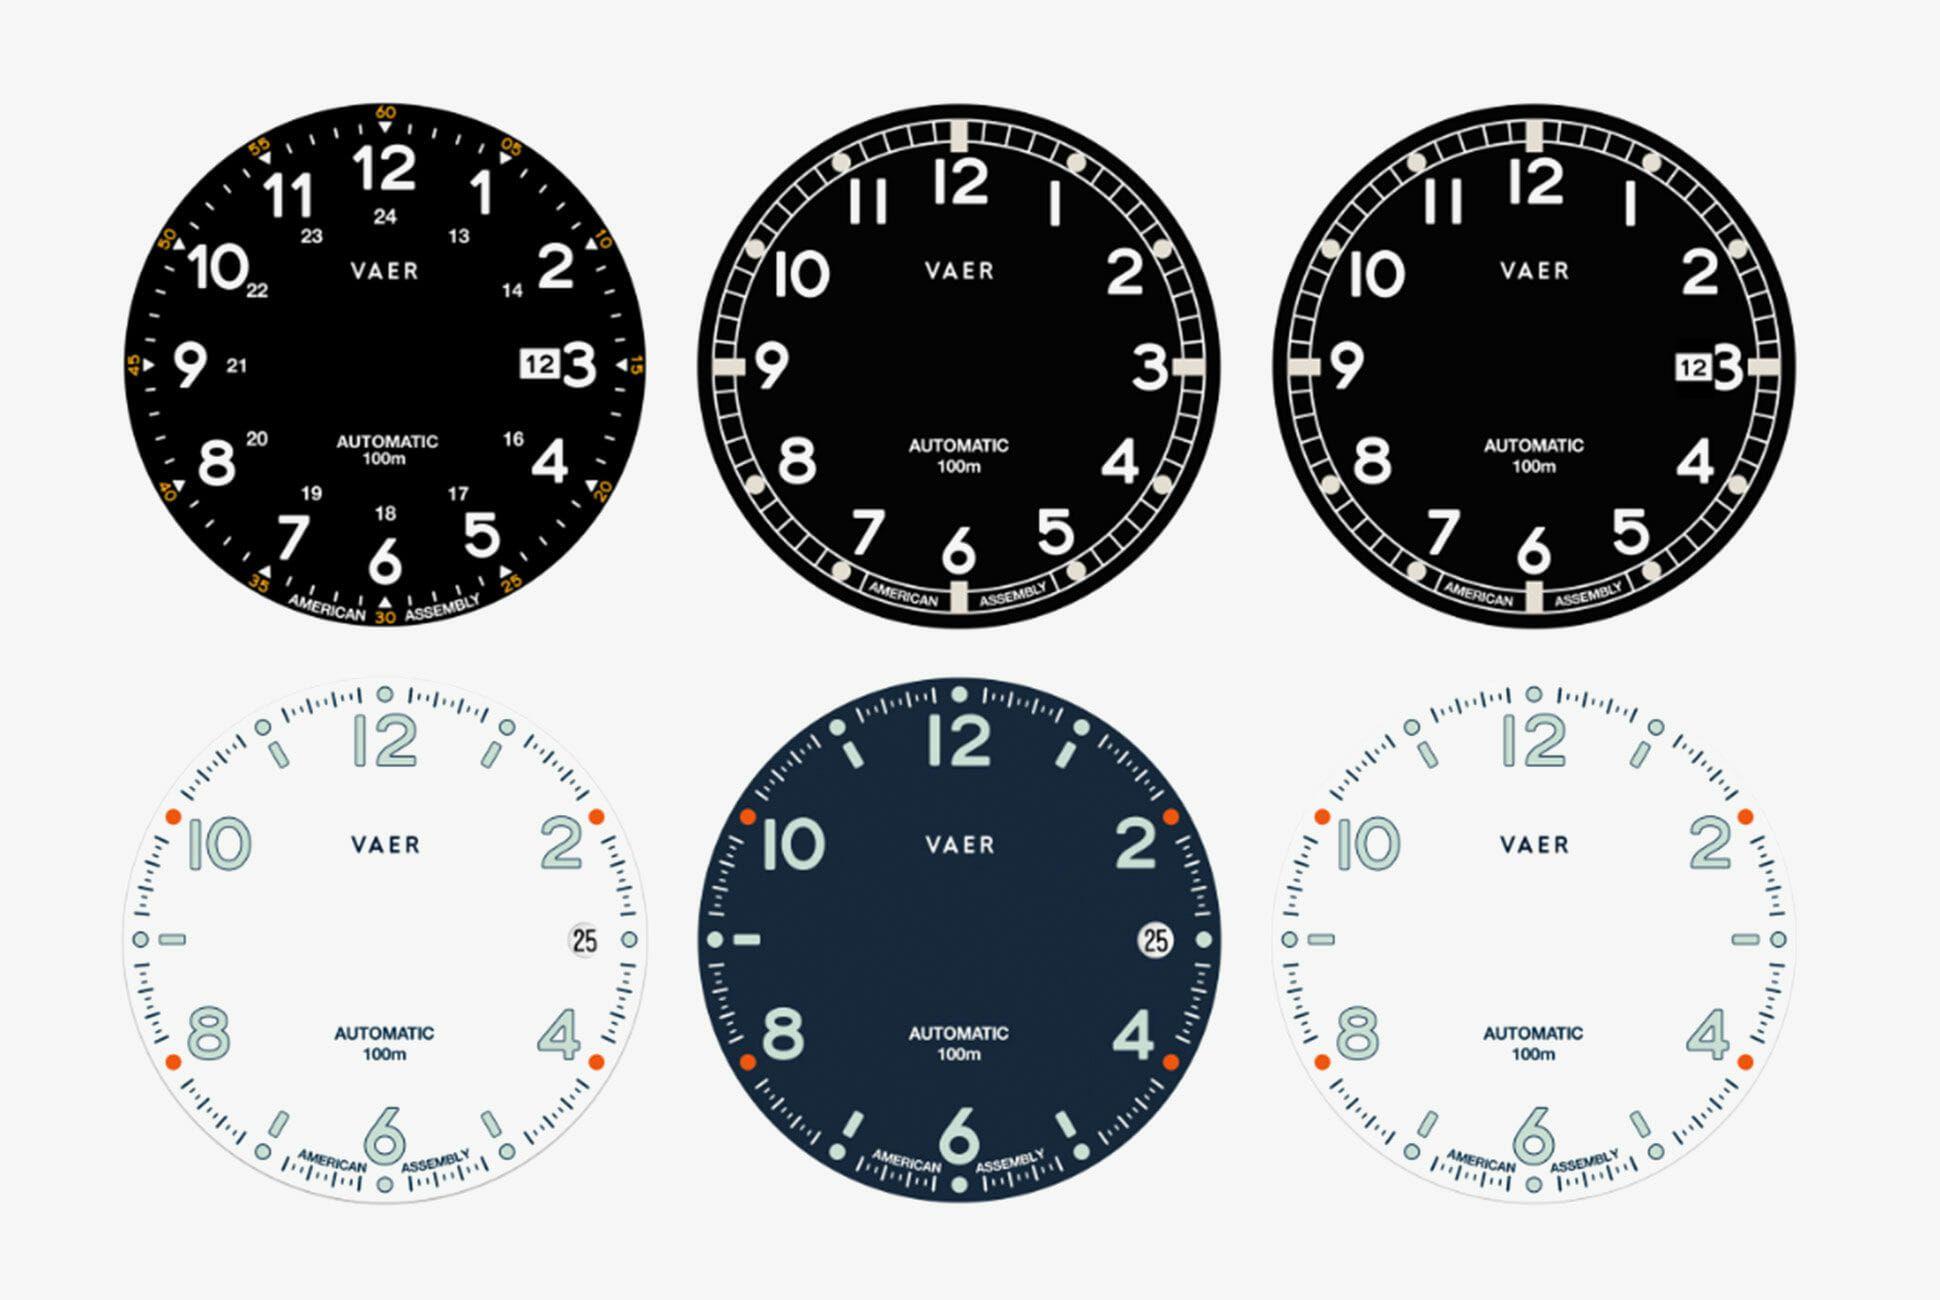 Vaer-Automatic-Field-Watches-gear-patrol-slide-4